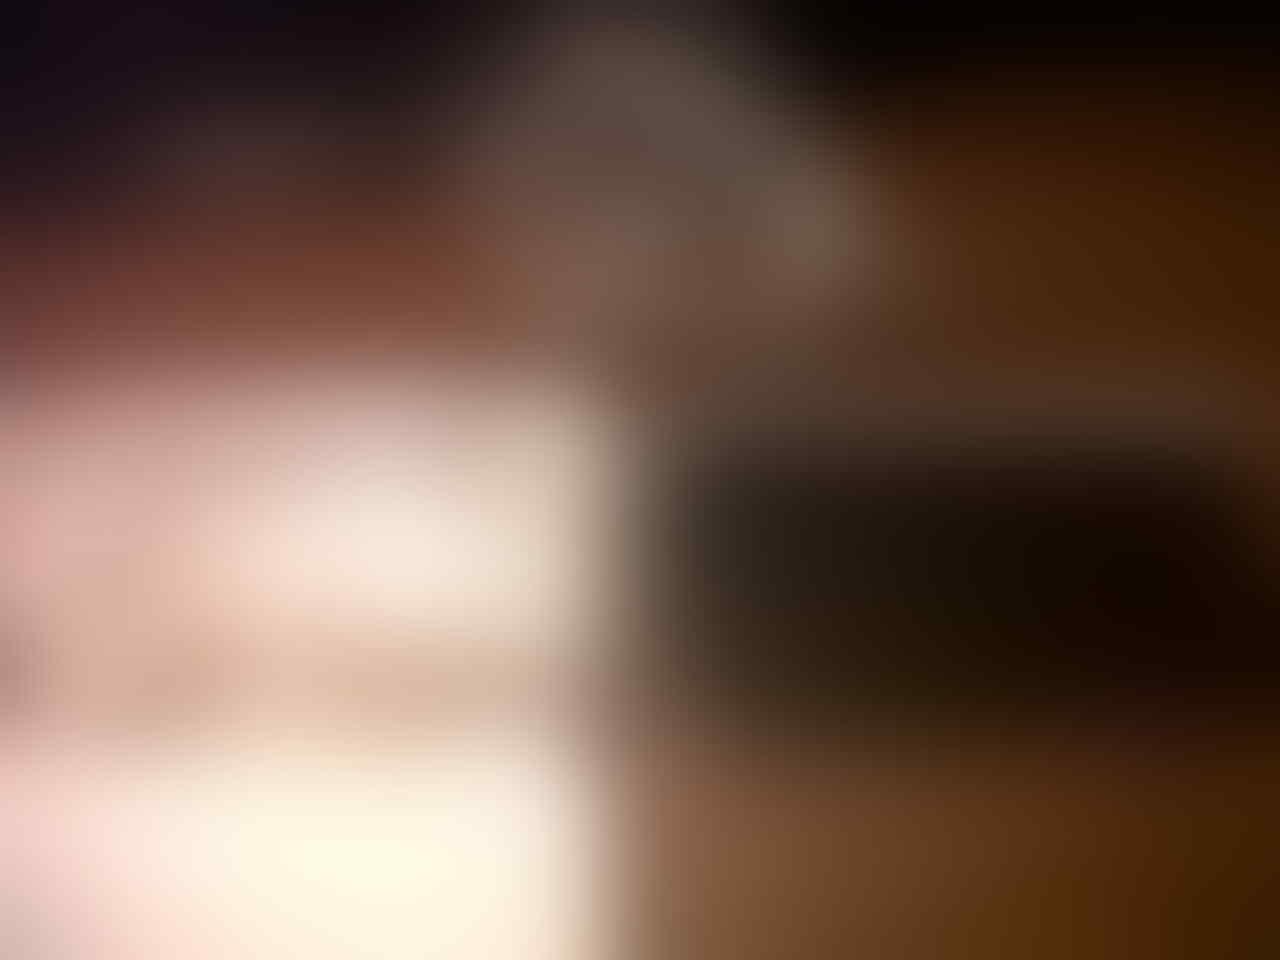 JUAALL CEPAT IPOD TOUCH 4 GENERATION 8 GB !!!!!!